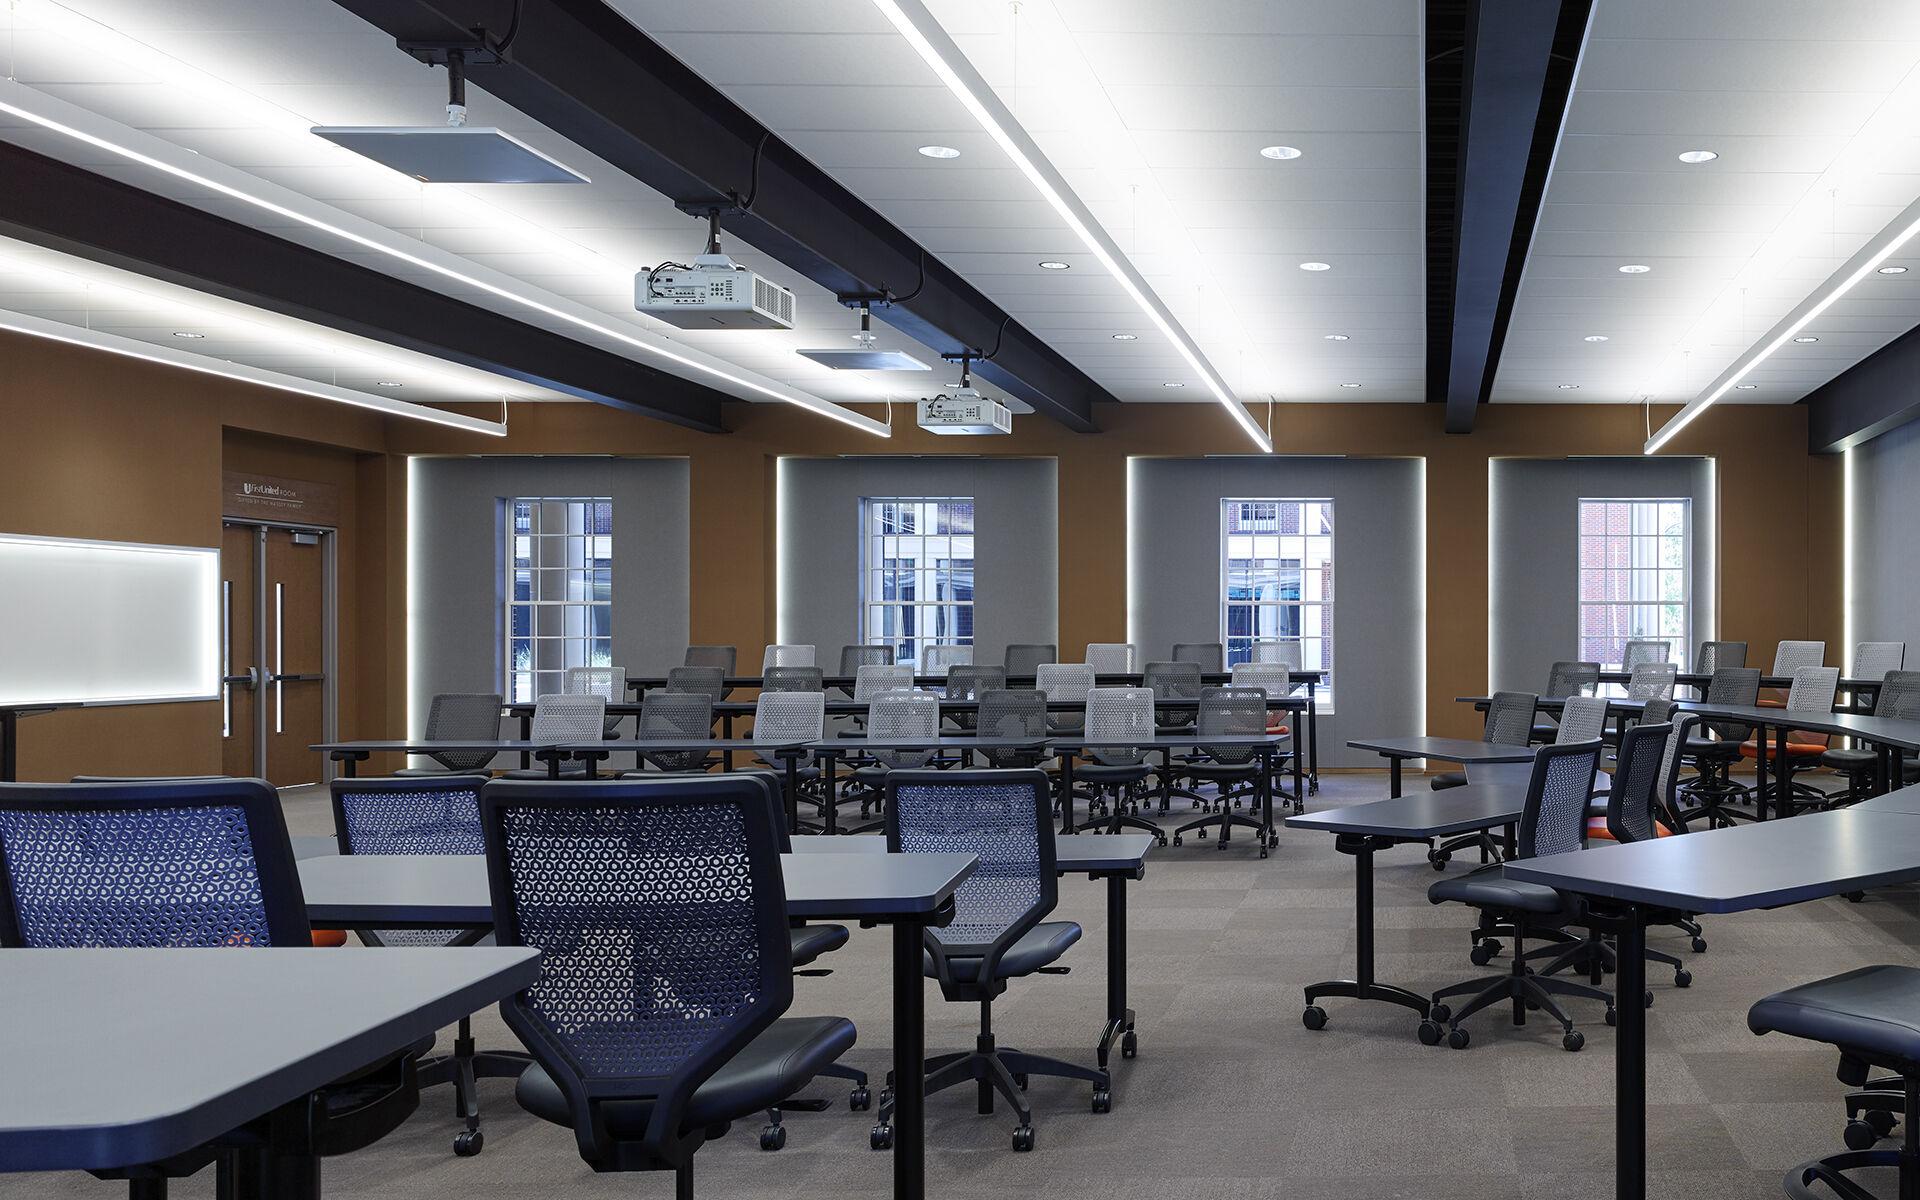 Spears School of Business - Oklahoma State University